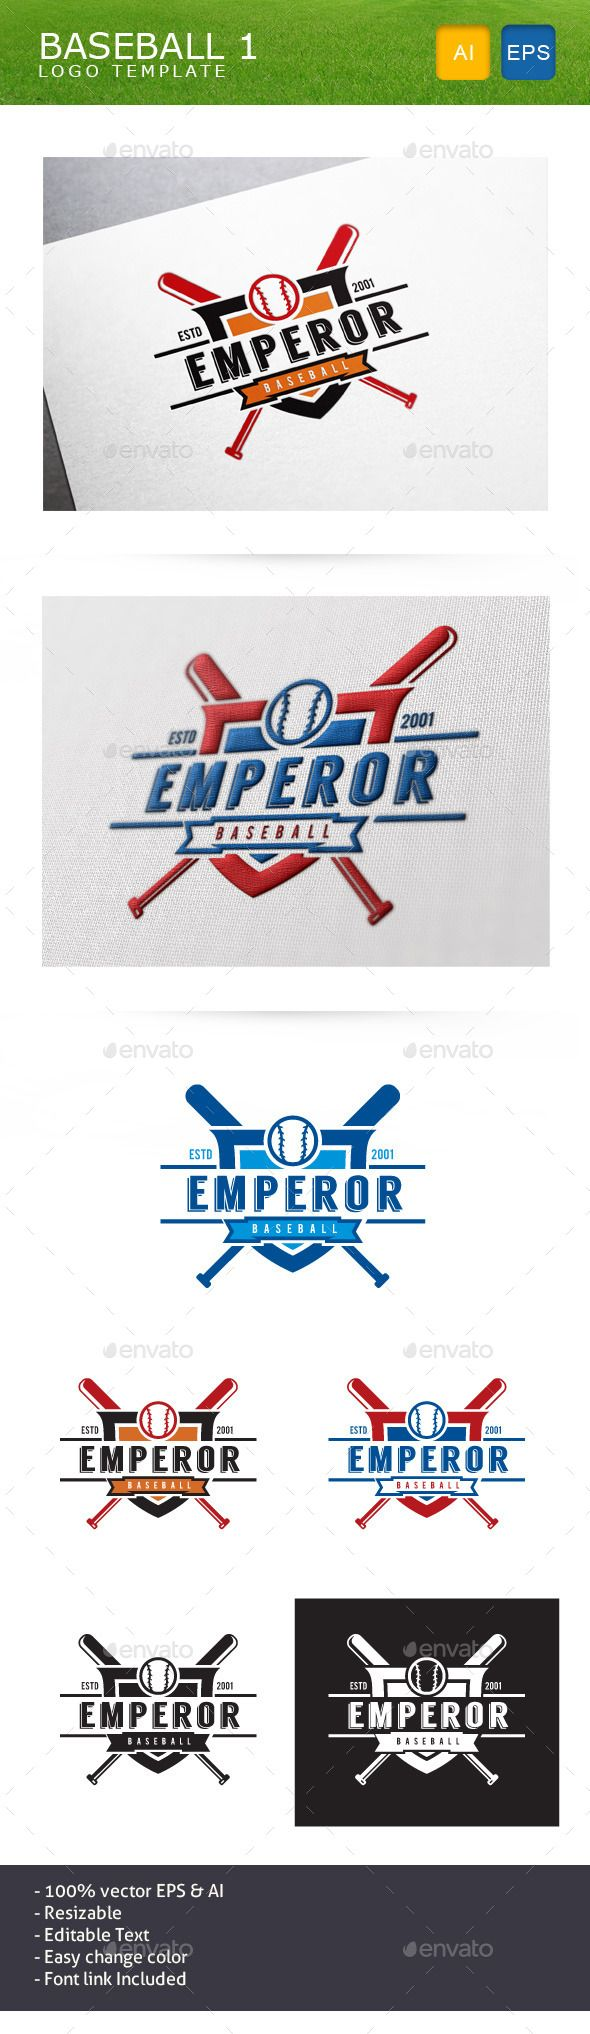 Baseball Team - Logo Design Template Vector #logotype Download it here: http://graphicriver.net/item/baseball-team/10999311?s_rank=670?ref=nexion